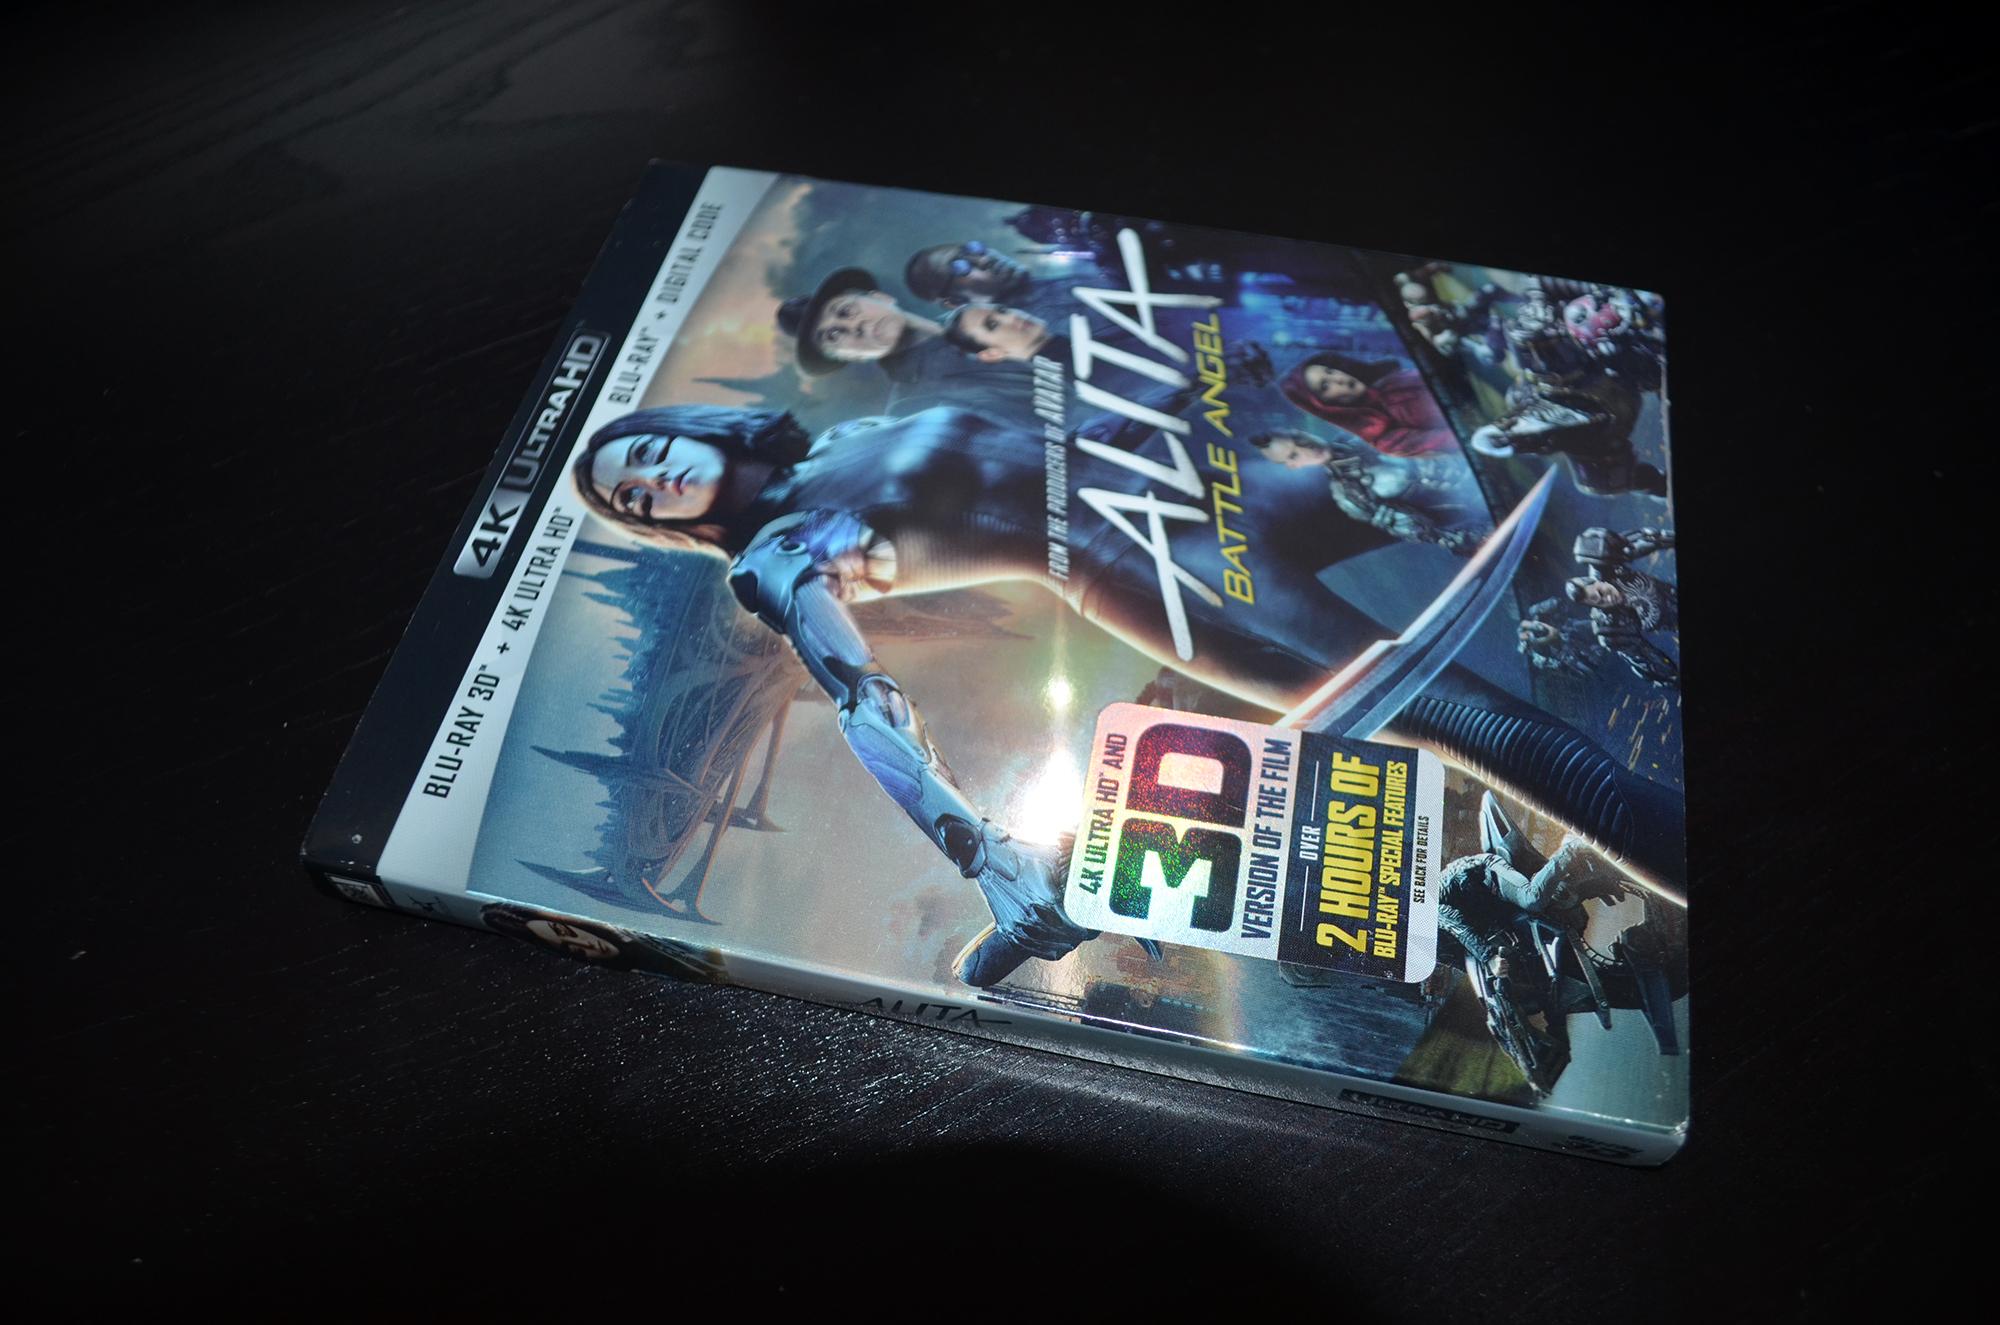 Alita Battle Angel 4K Review